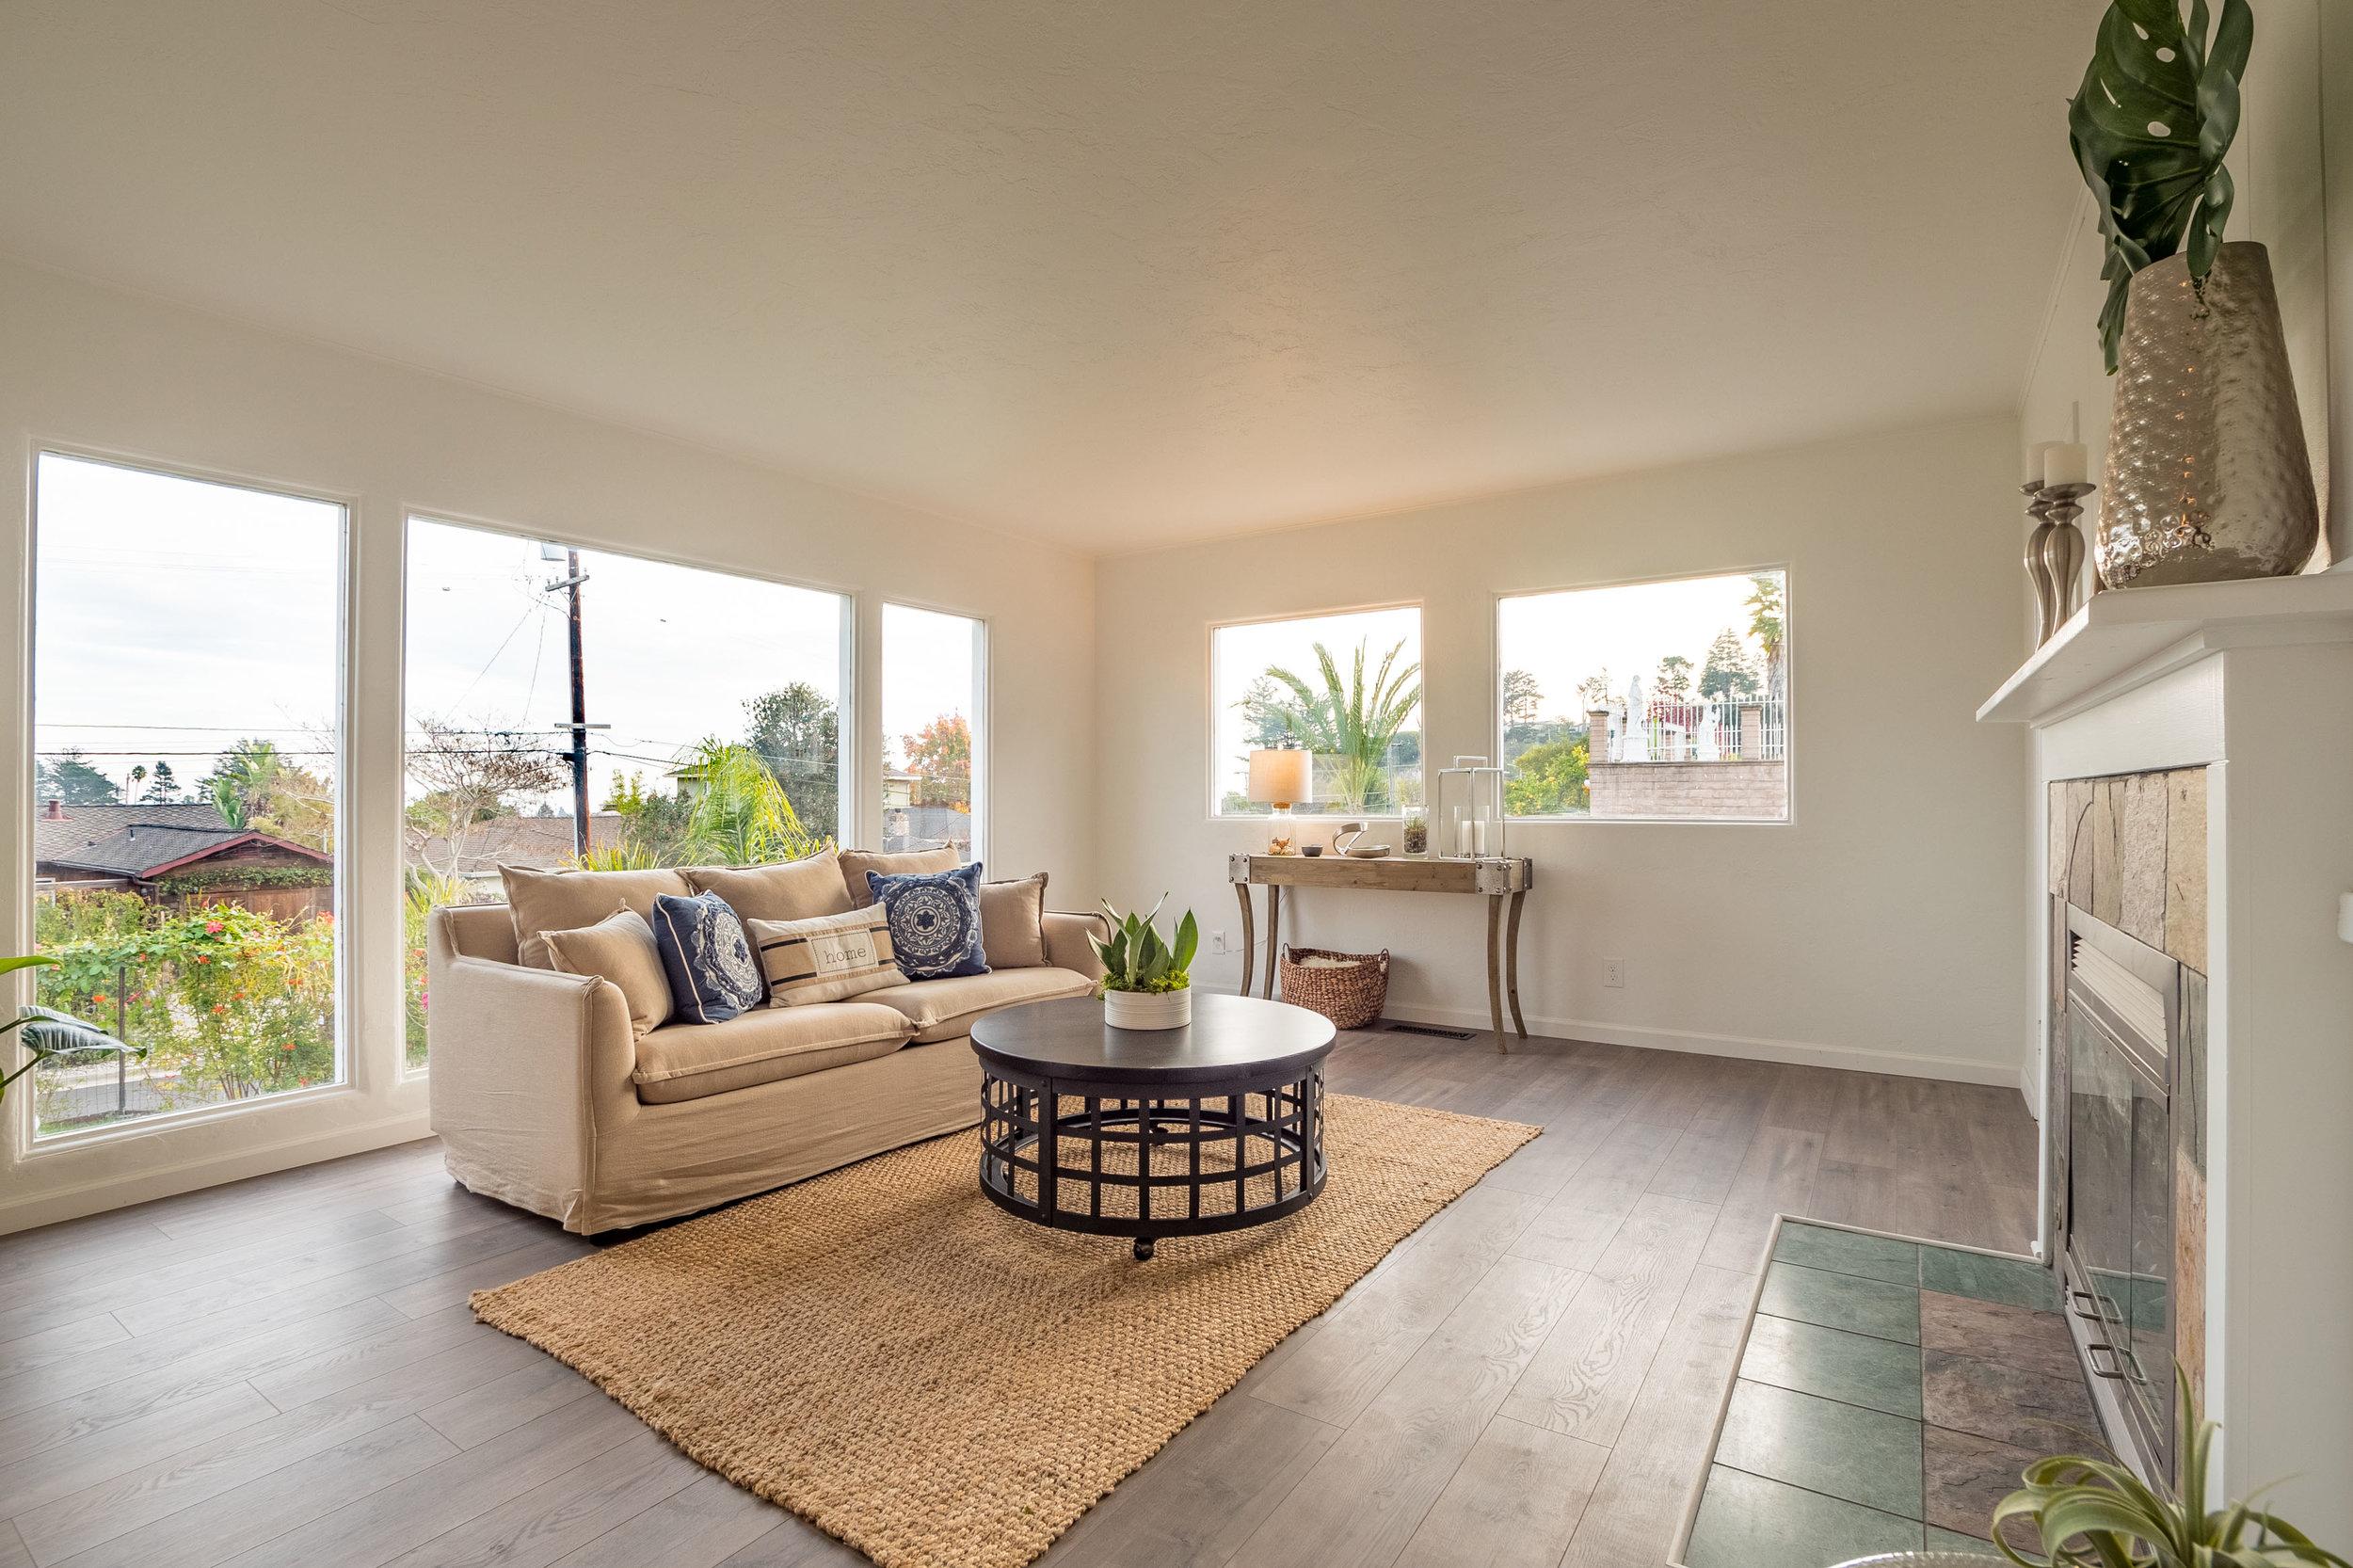 Living Room with Fireplace Santa Cruz Home